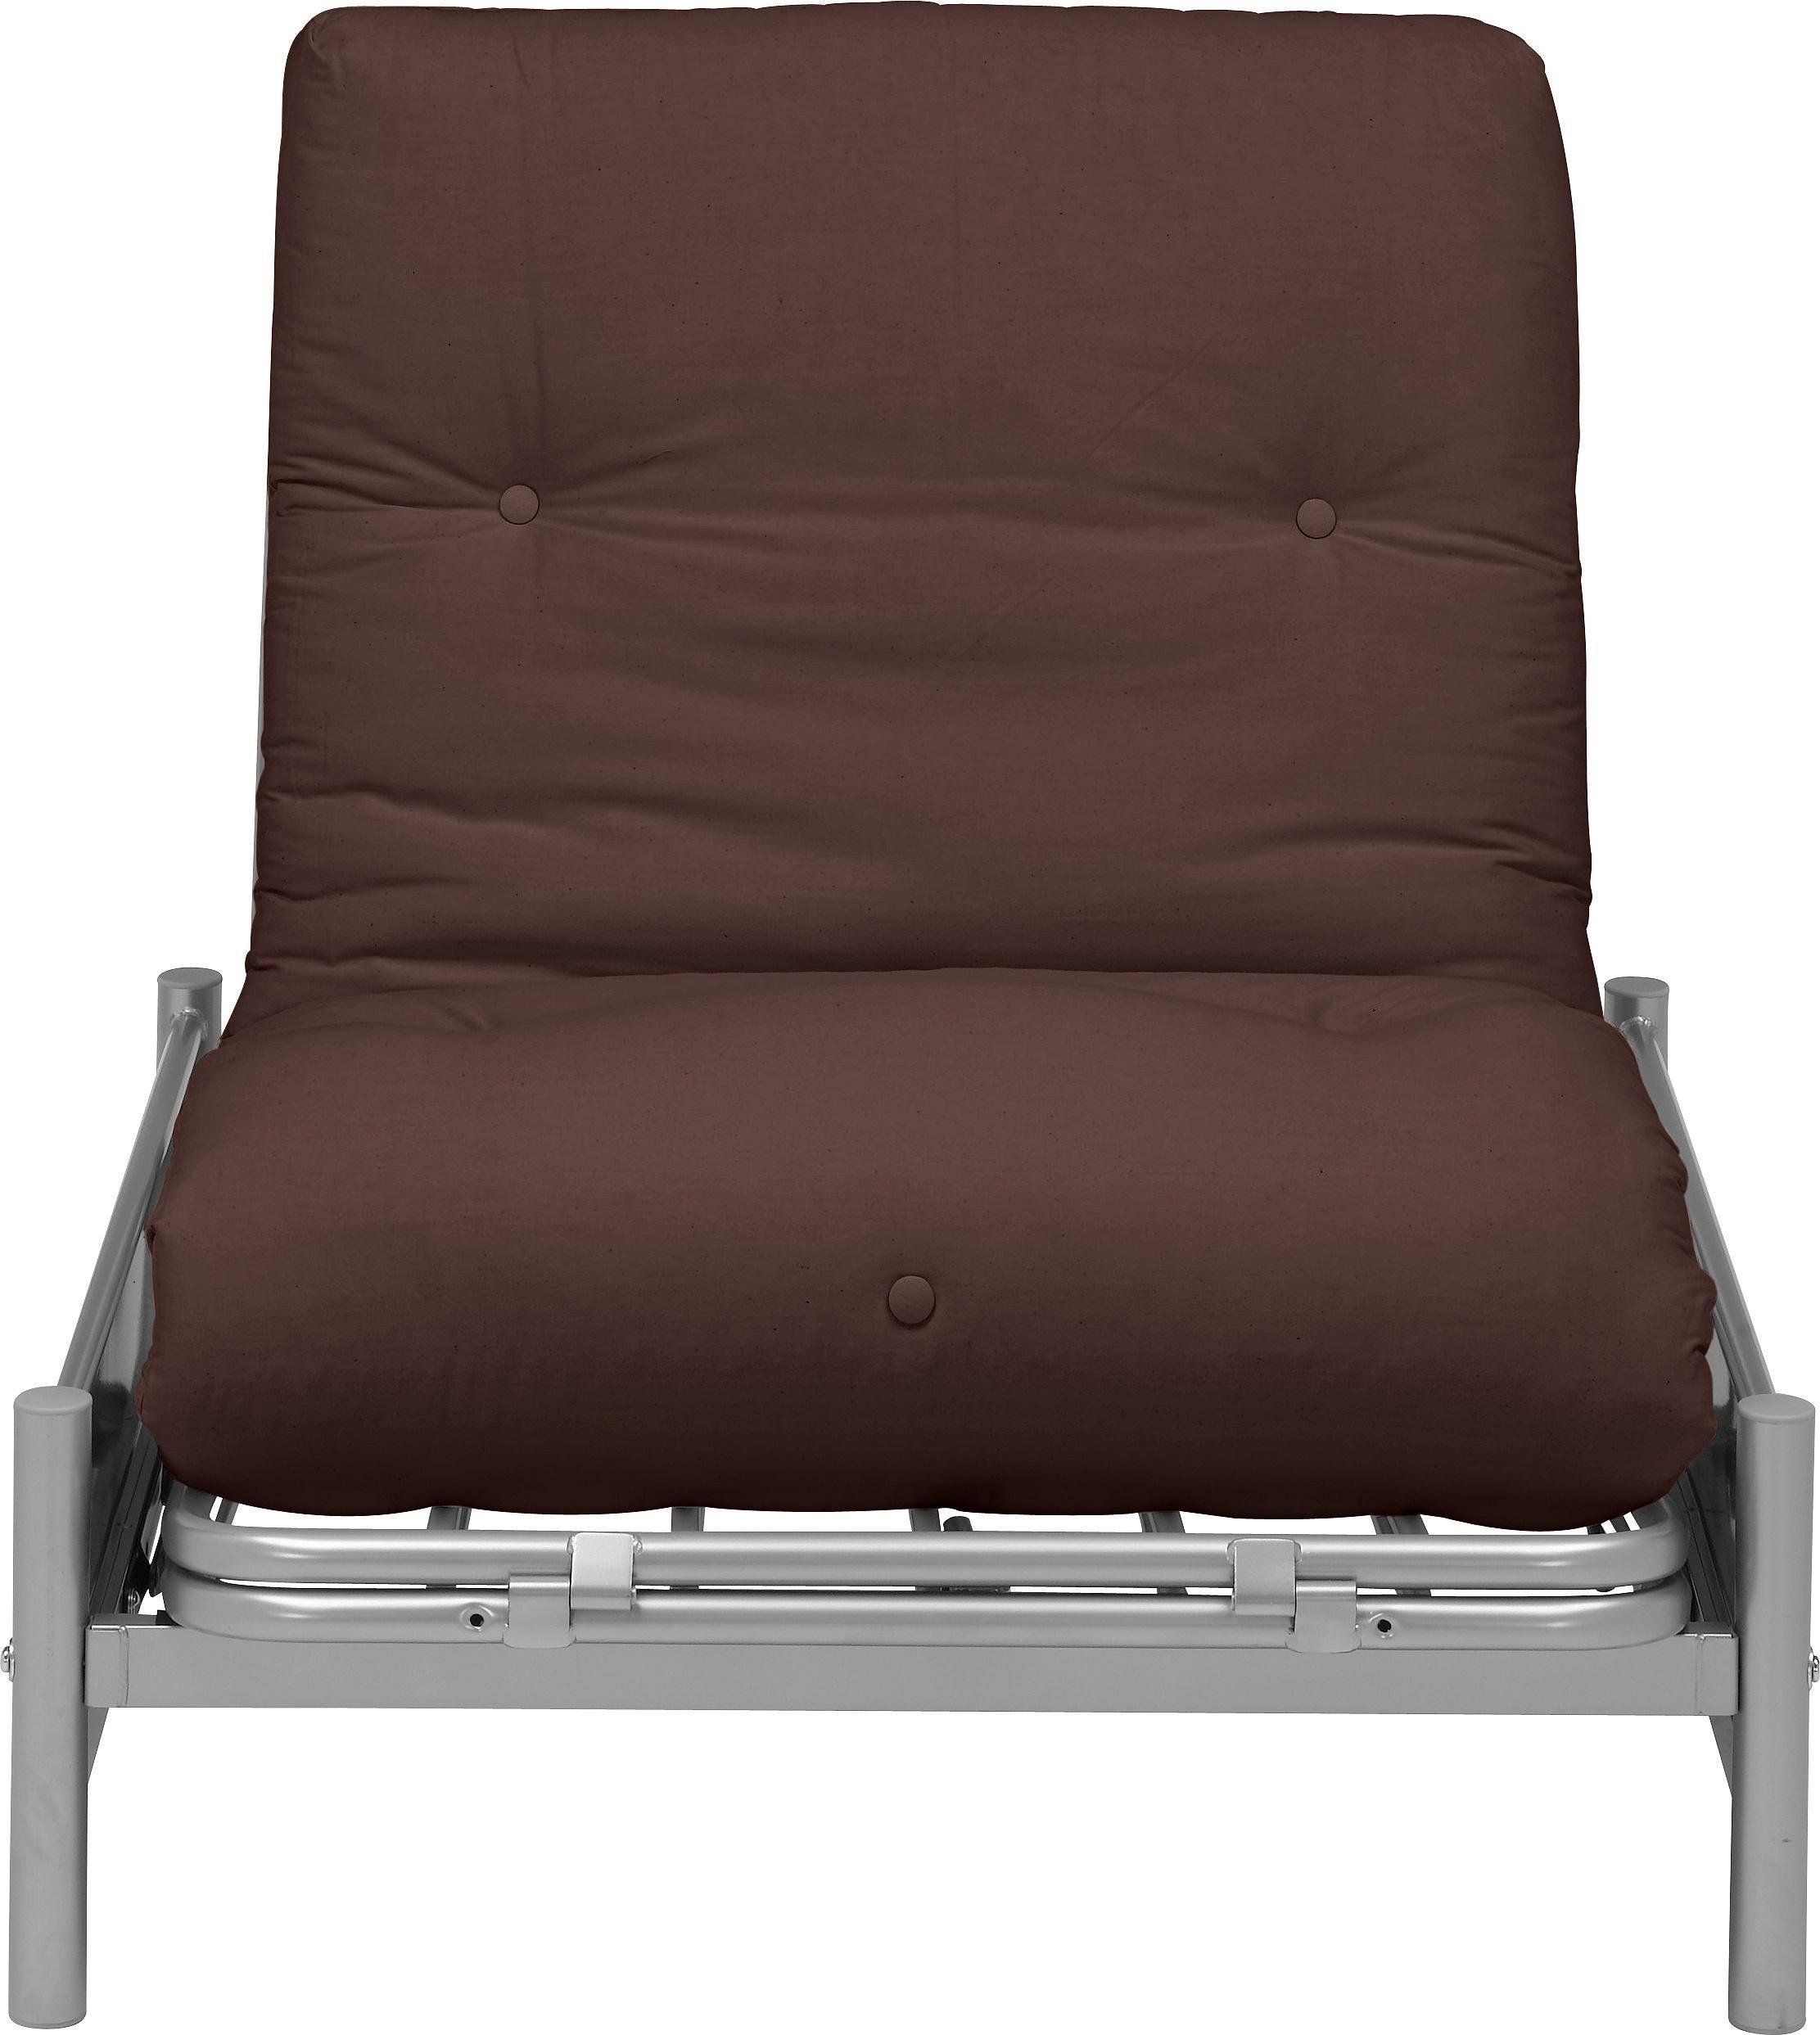 Argos Home Single Futon Metal Sofa Bed w/ Mattress - Choc